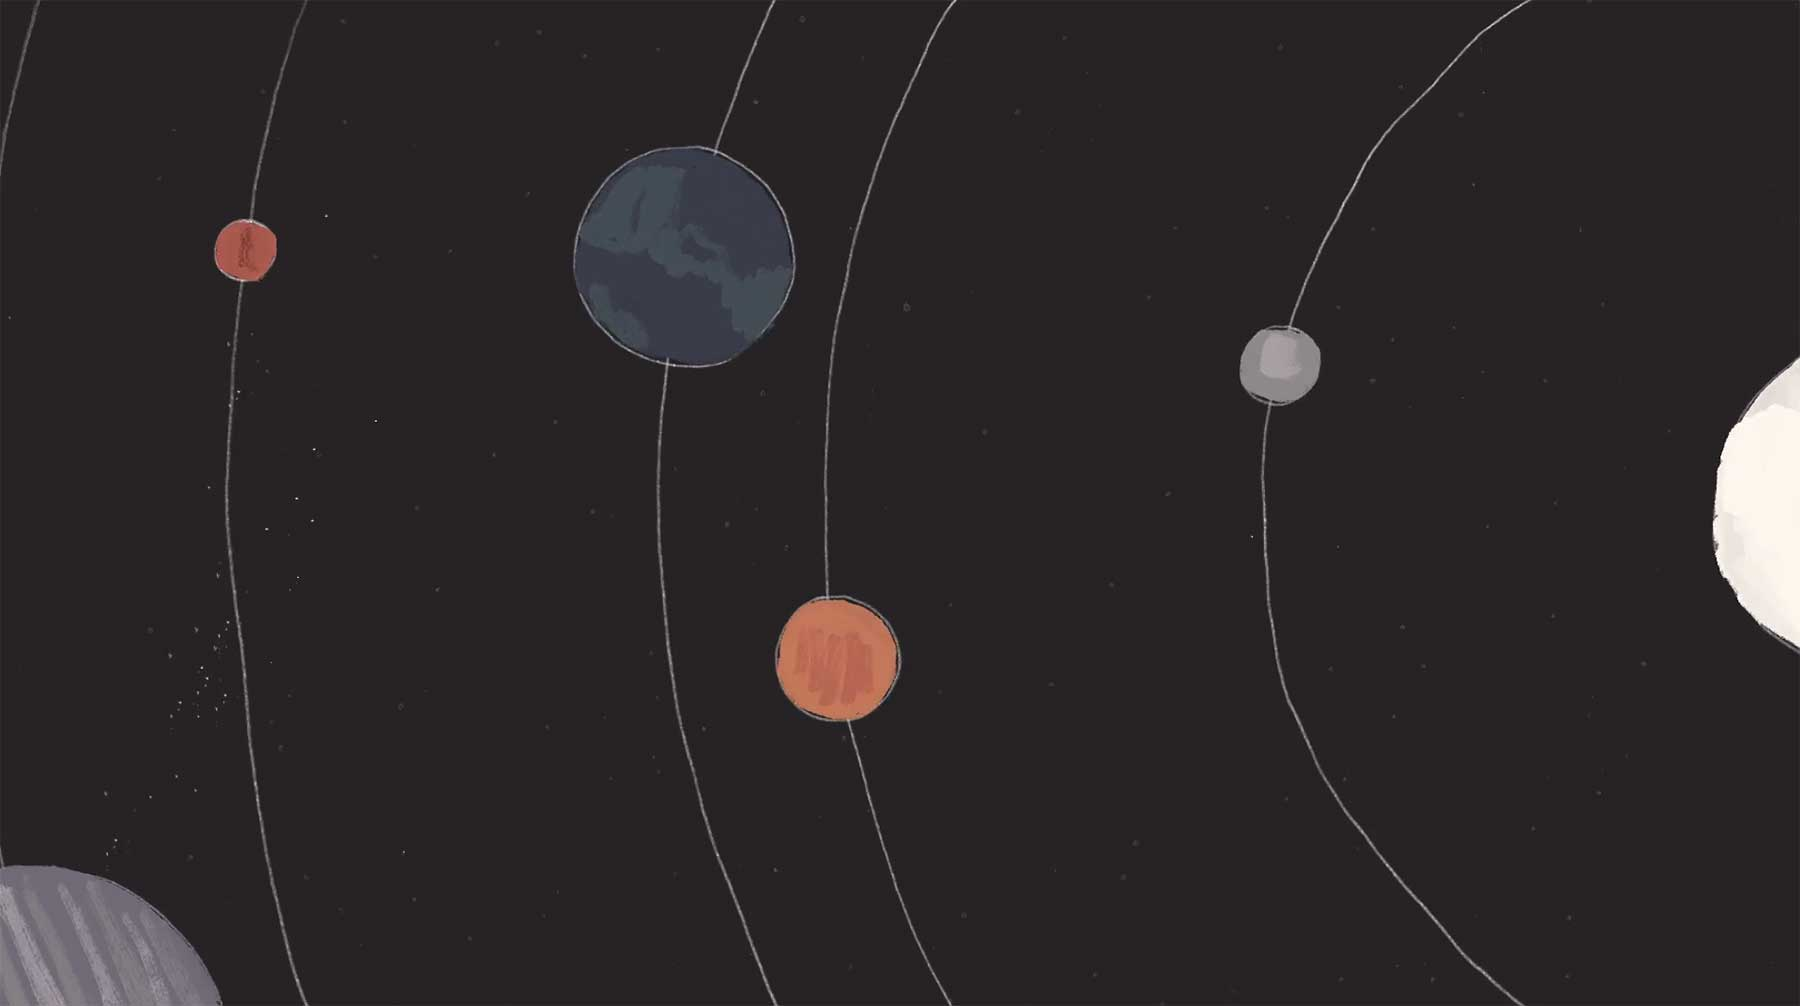 Sonnensystem als Schallplatte spinning-record-animation